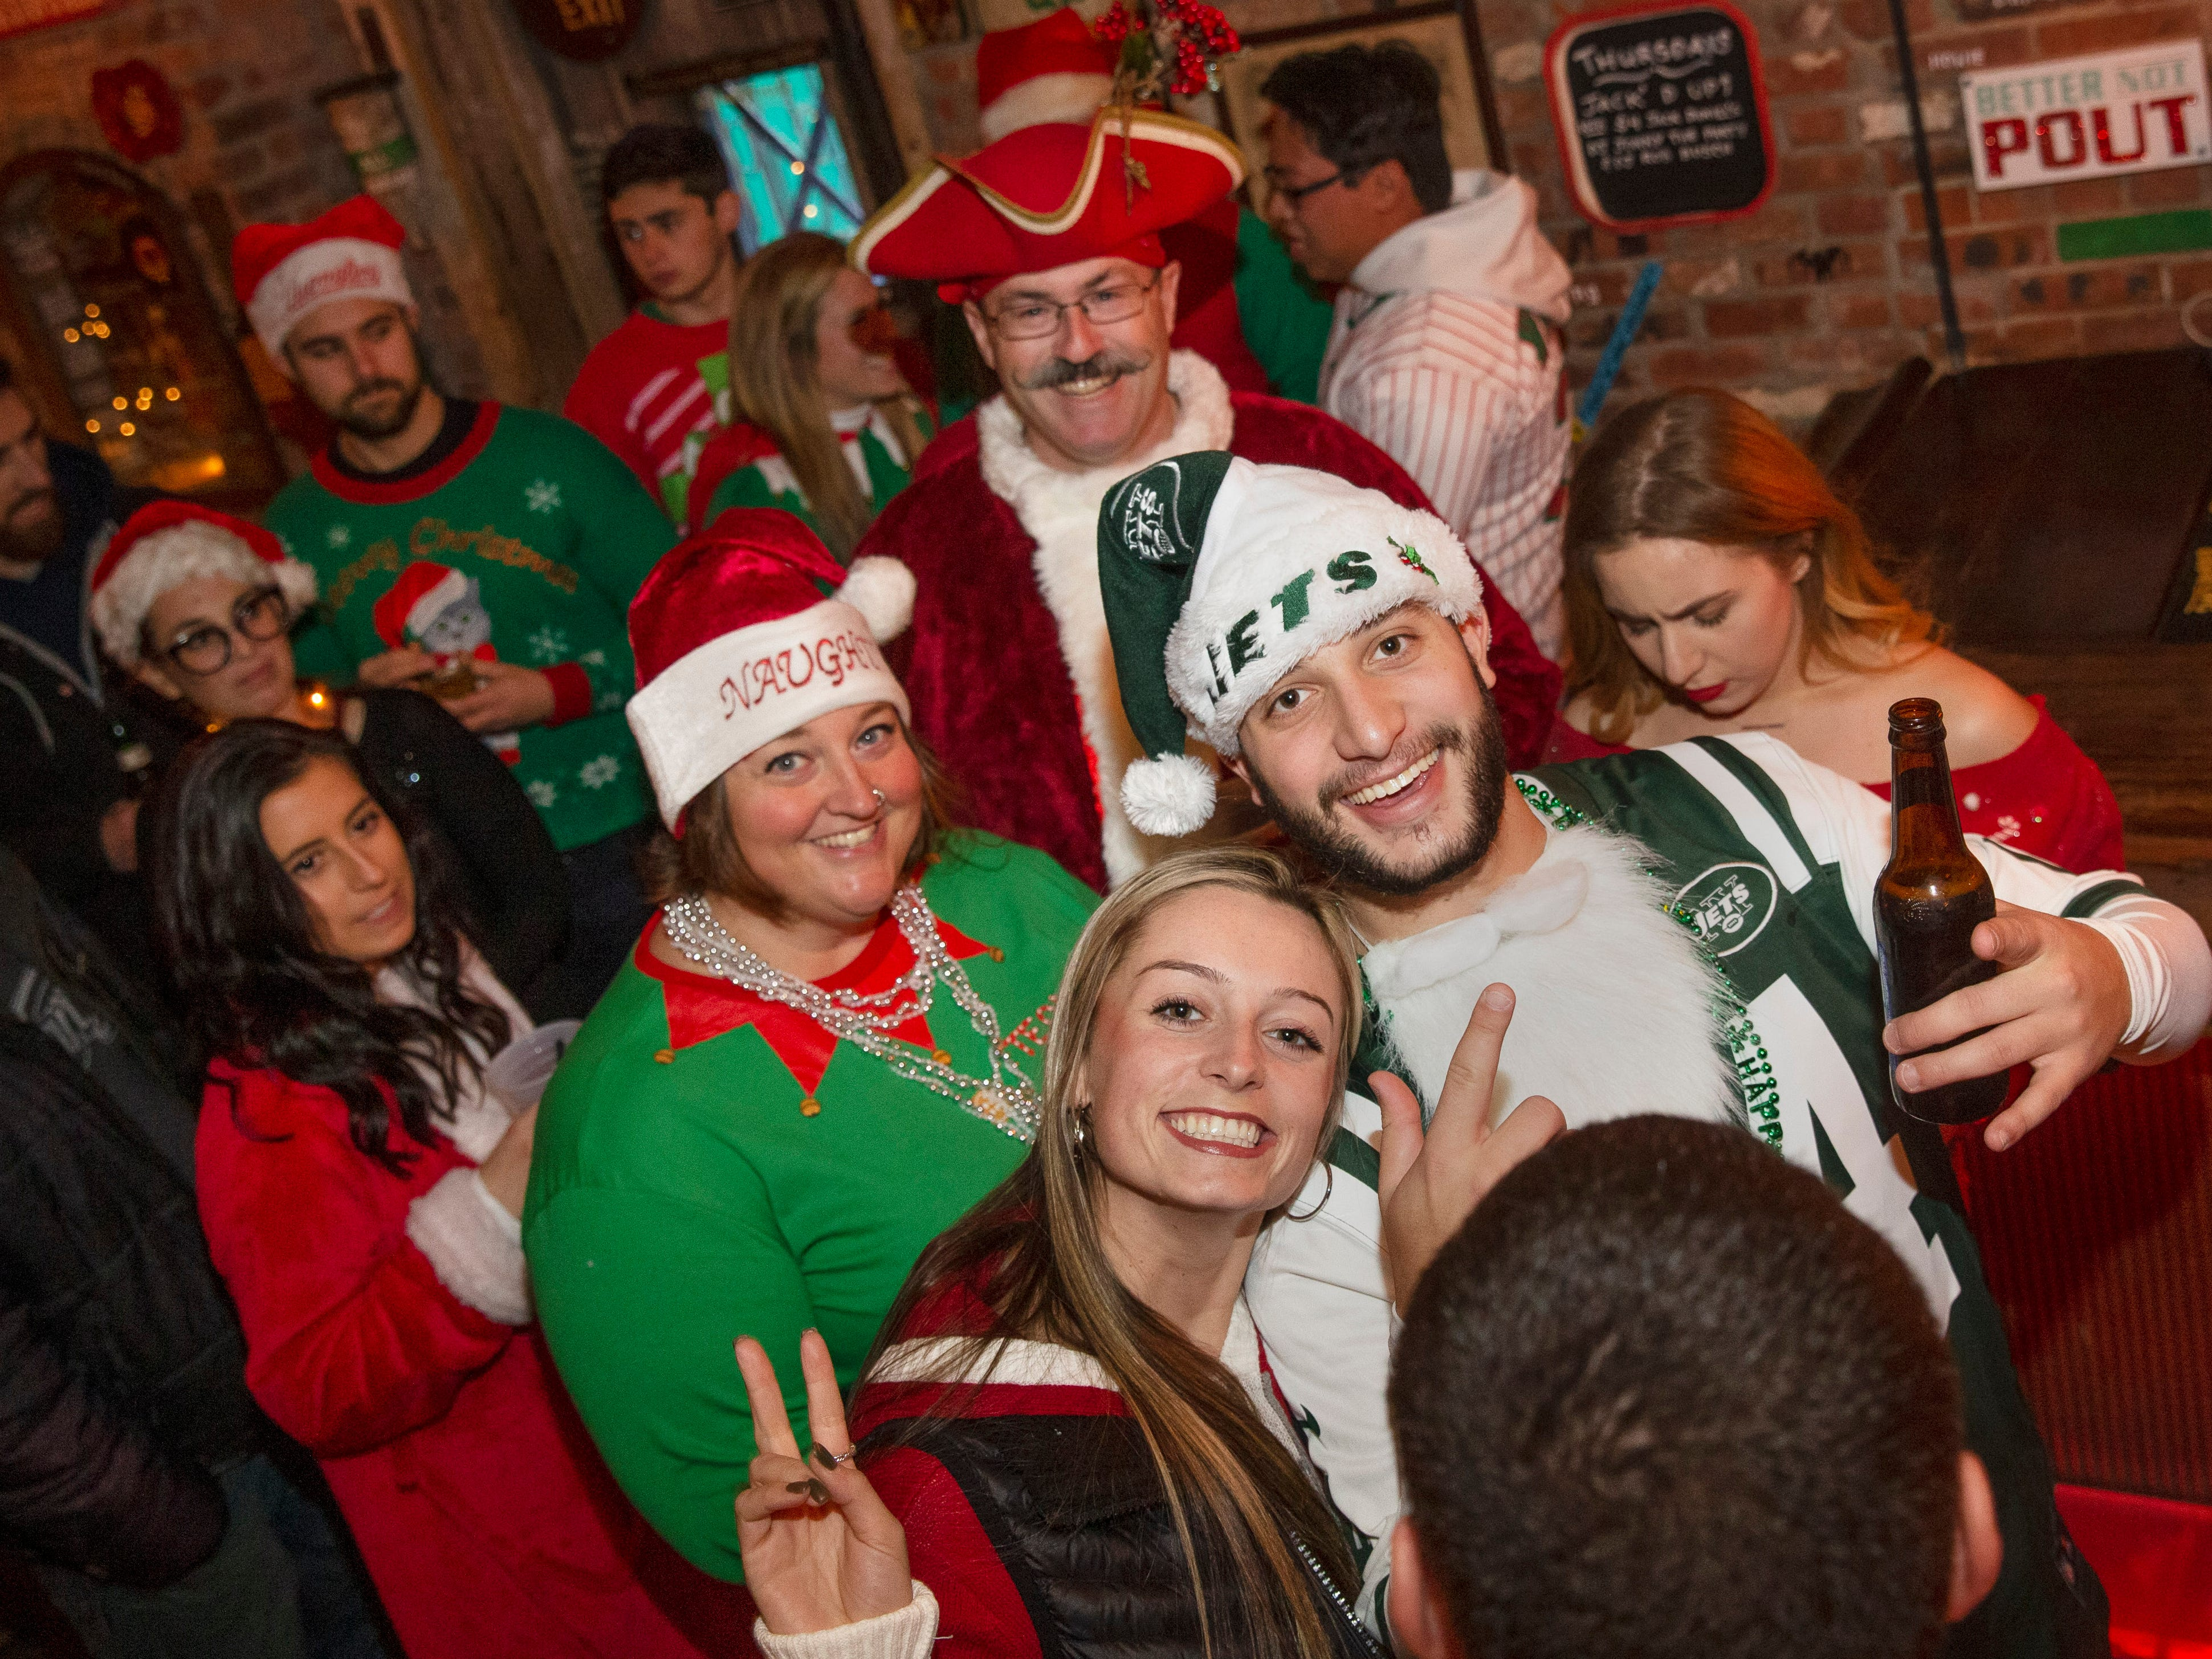 Johnny Mac House of Spirits during  SantaCon Bar Crawl through Asbury Park on December 8, 2018.